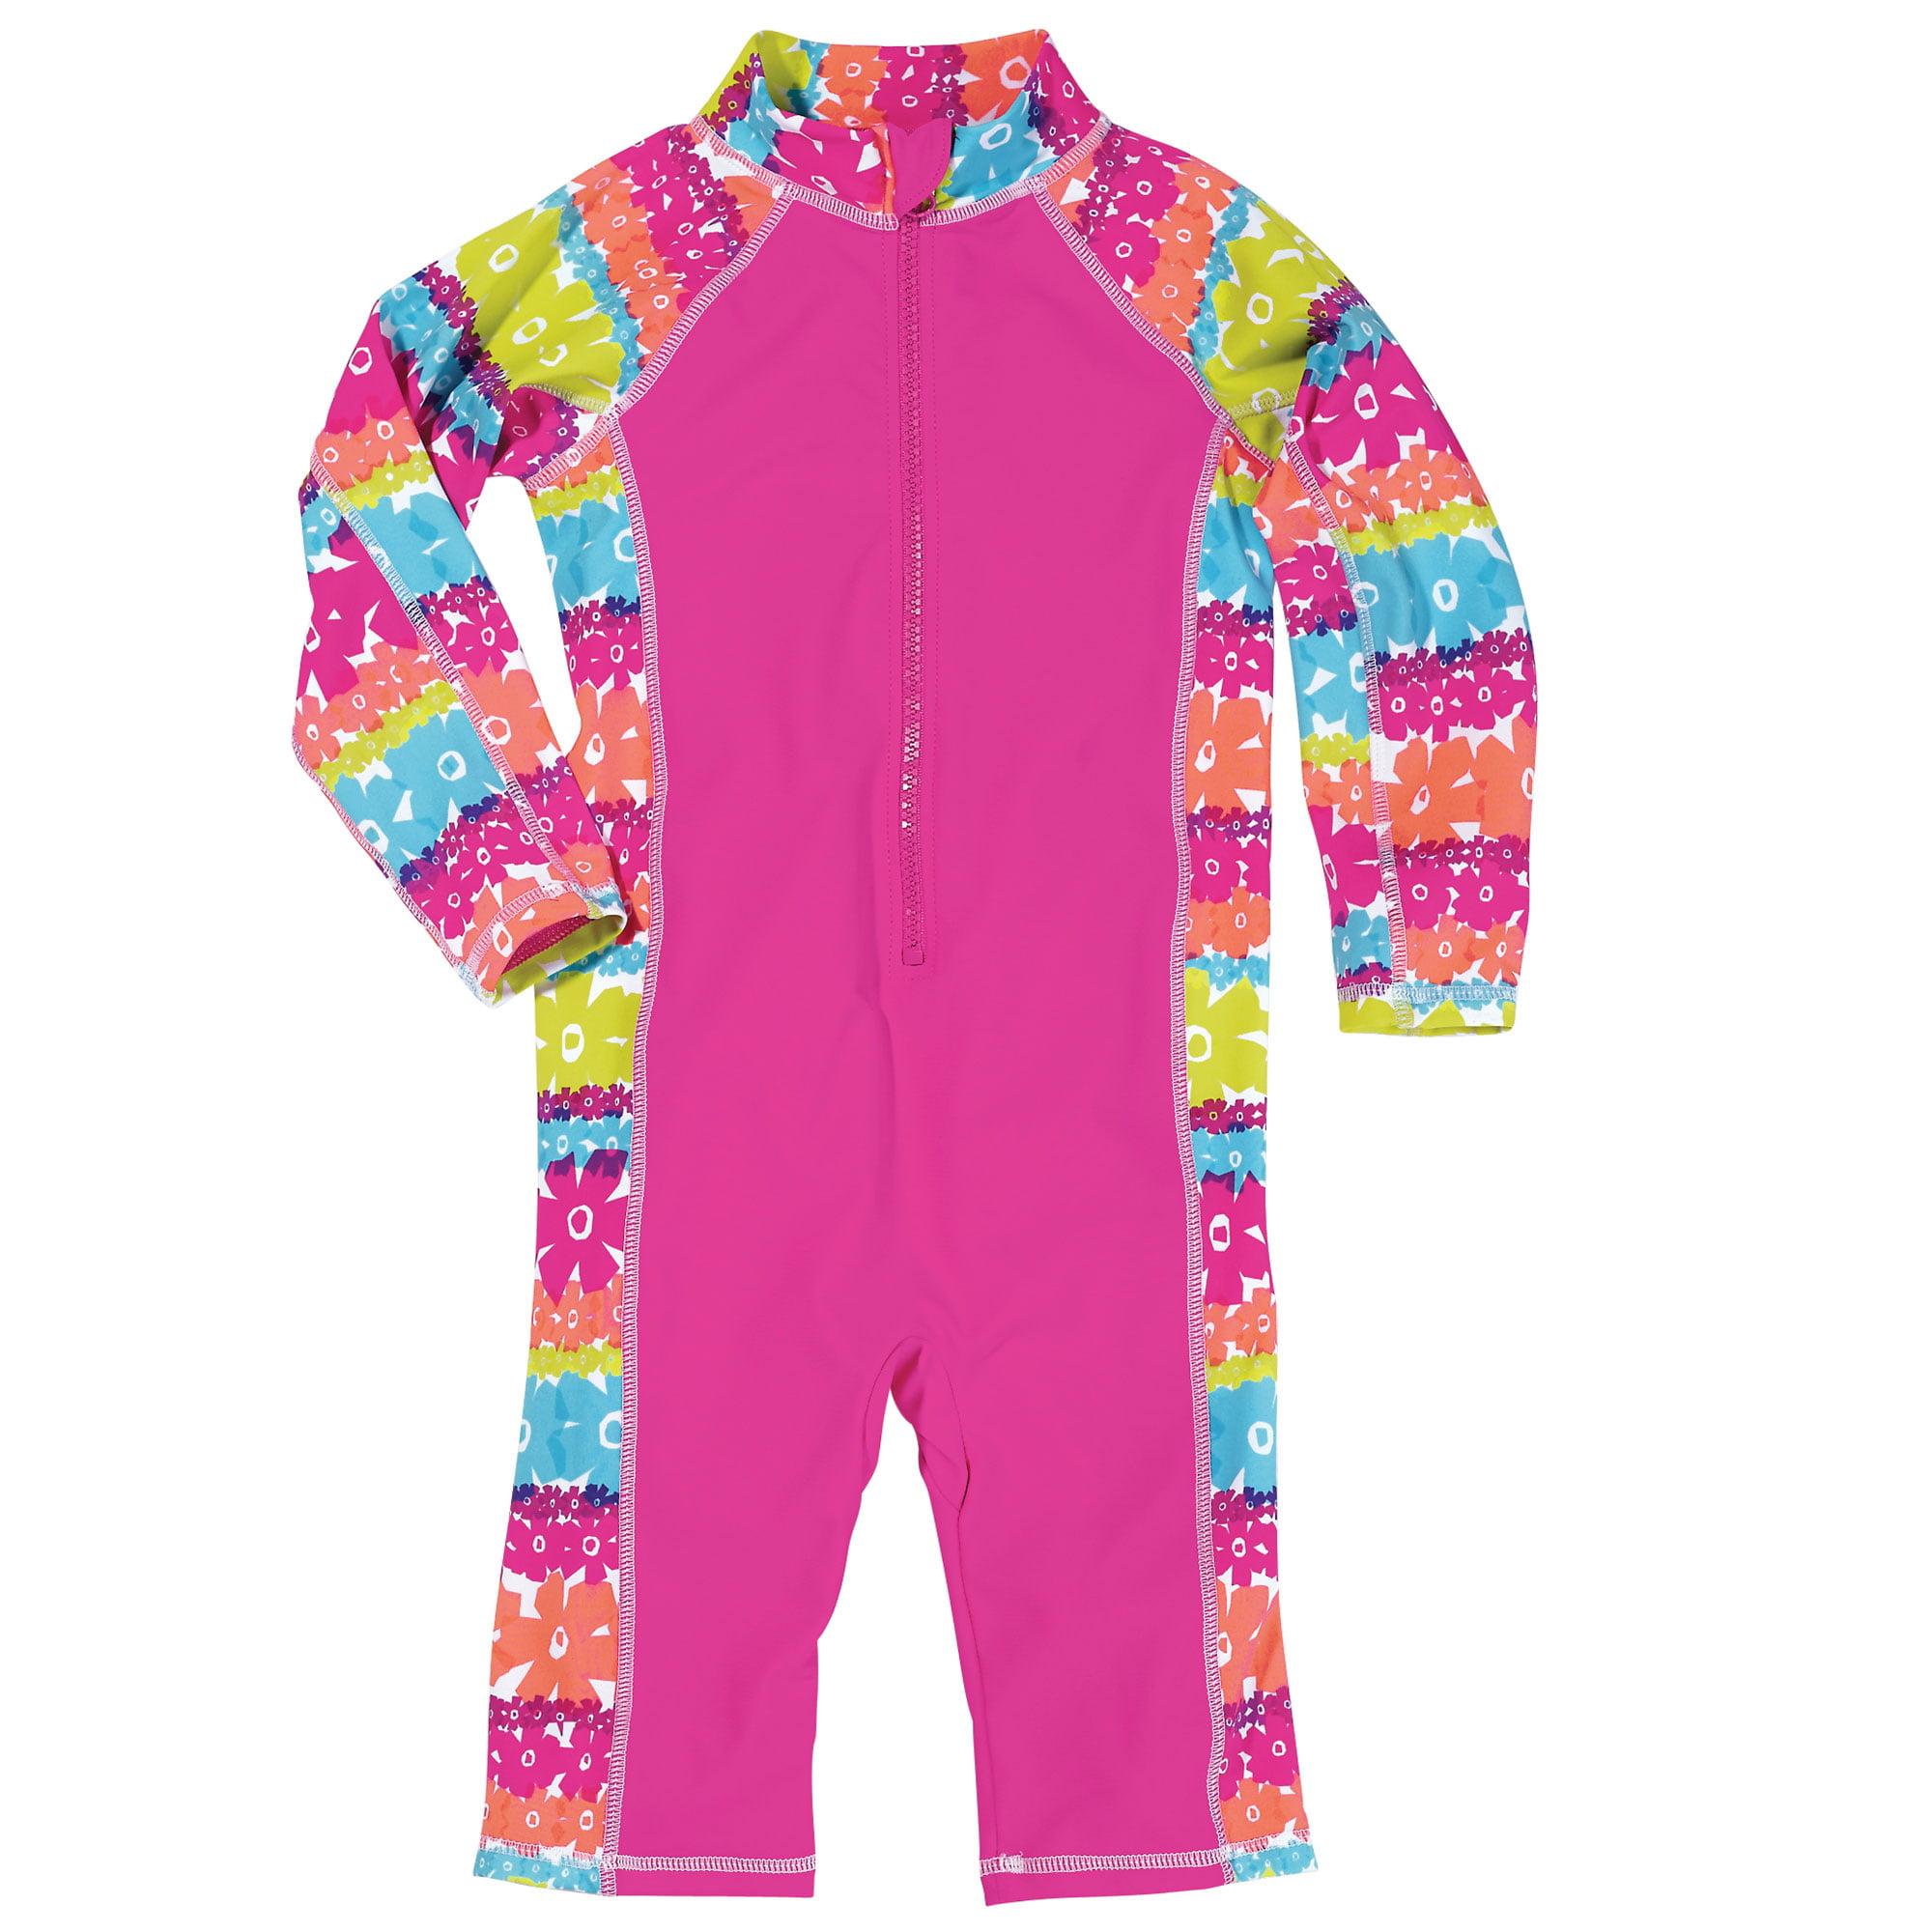 Sun Smarties Little Girl Surf Suit - Hot Pink Floral  - Maximum Sun Protection Swimsuit